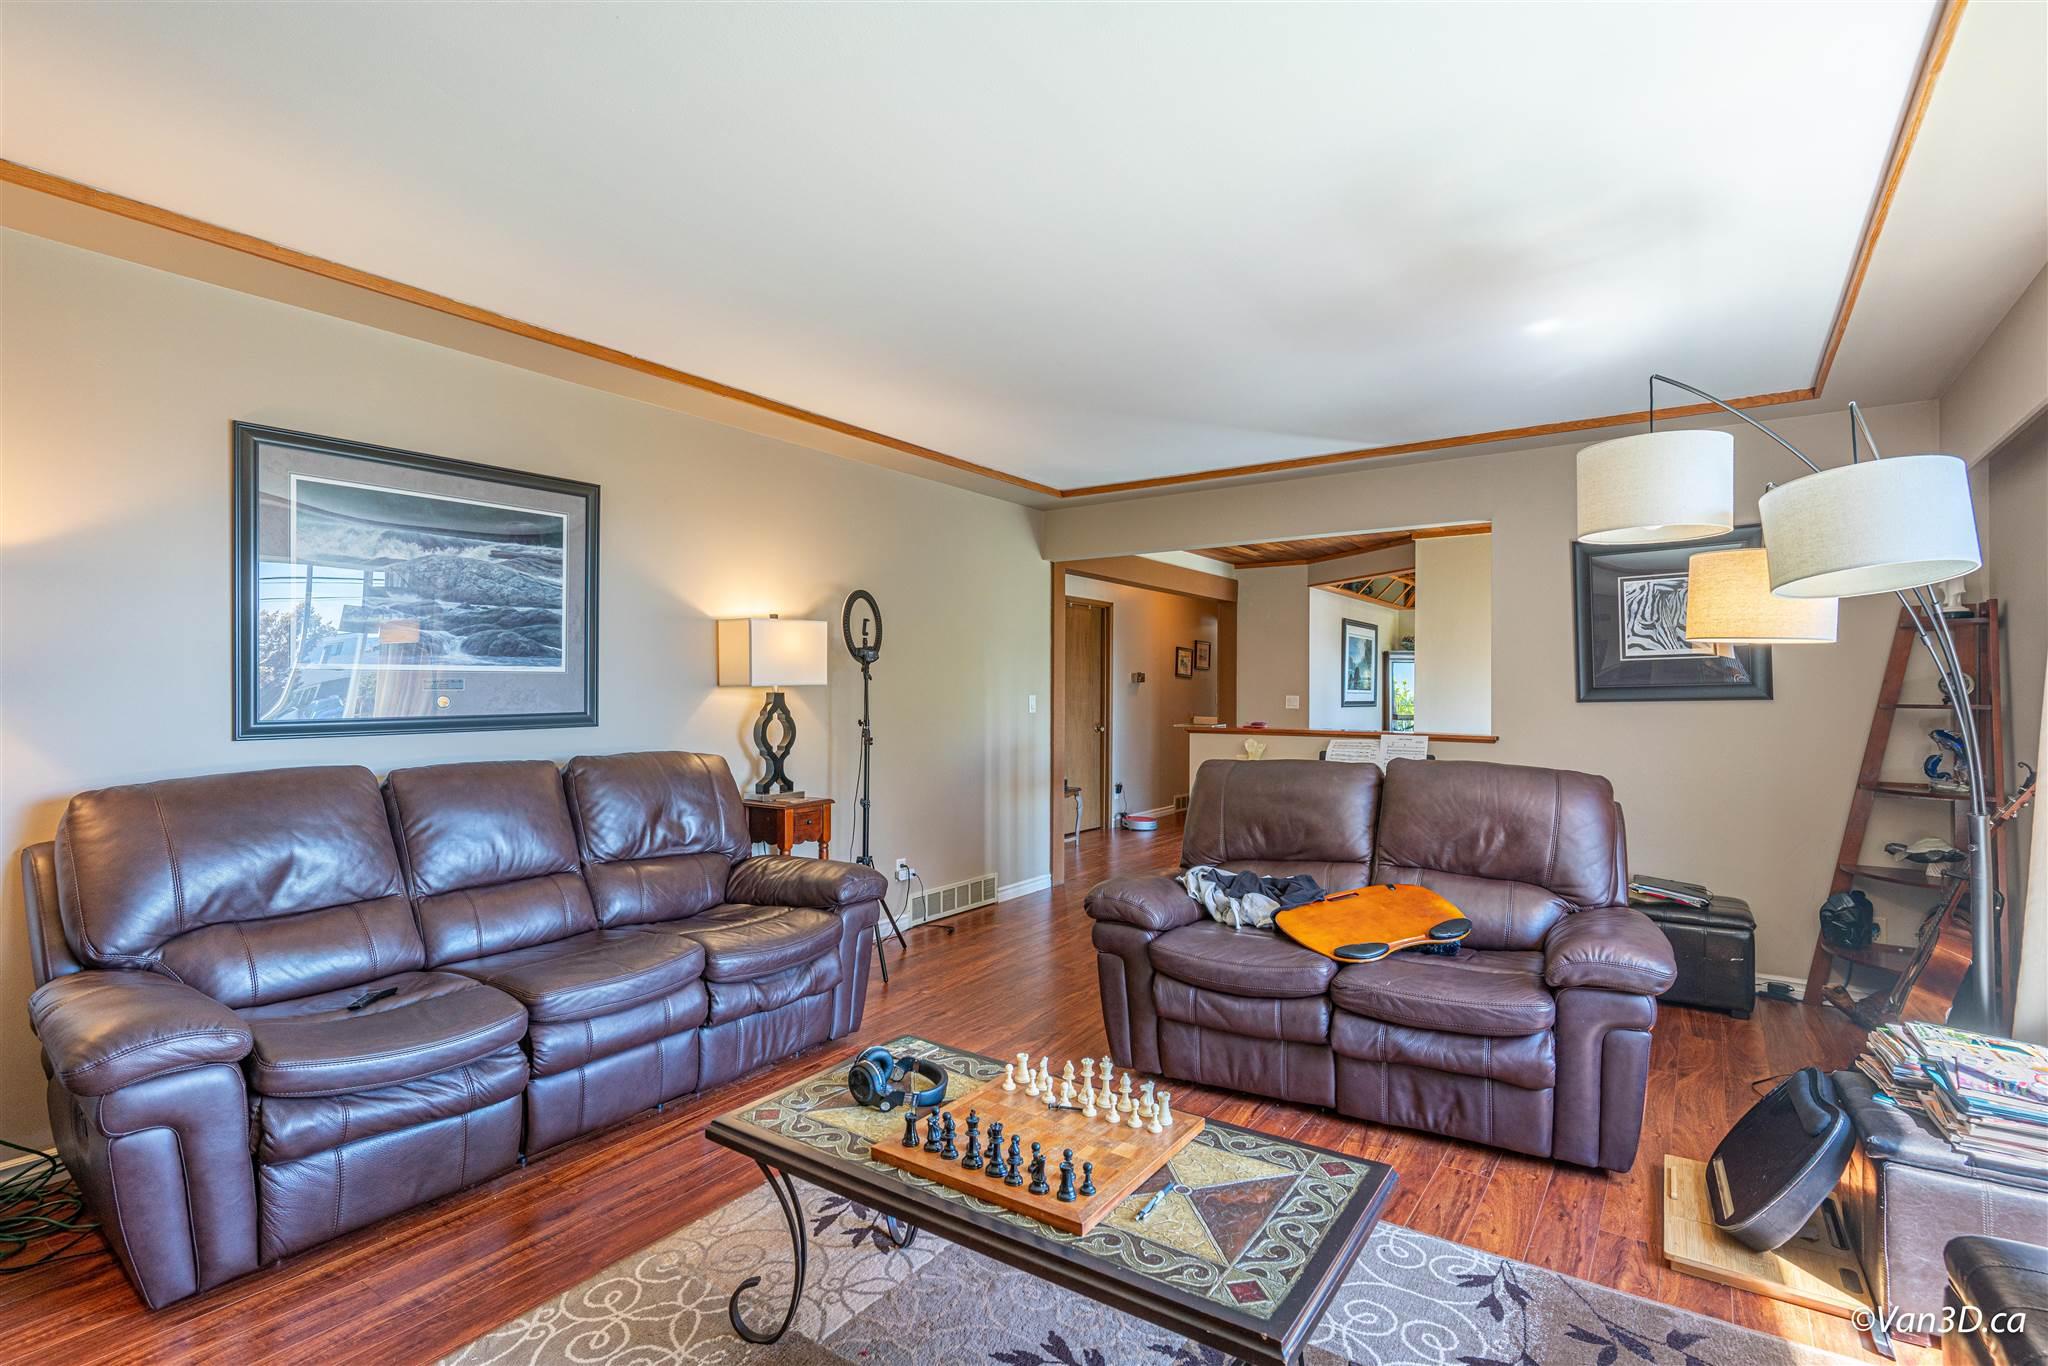 14495 MANN PARK CRESCENT - White Rock House/Single Family for sale, 4 Bedrooms (R2604561) - #18